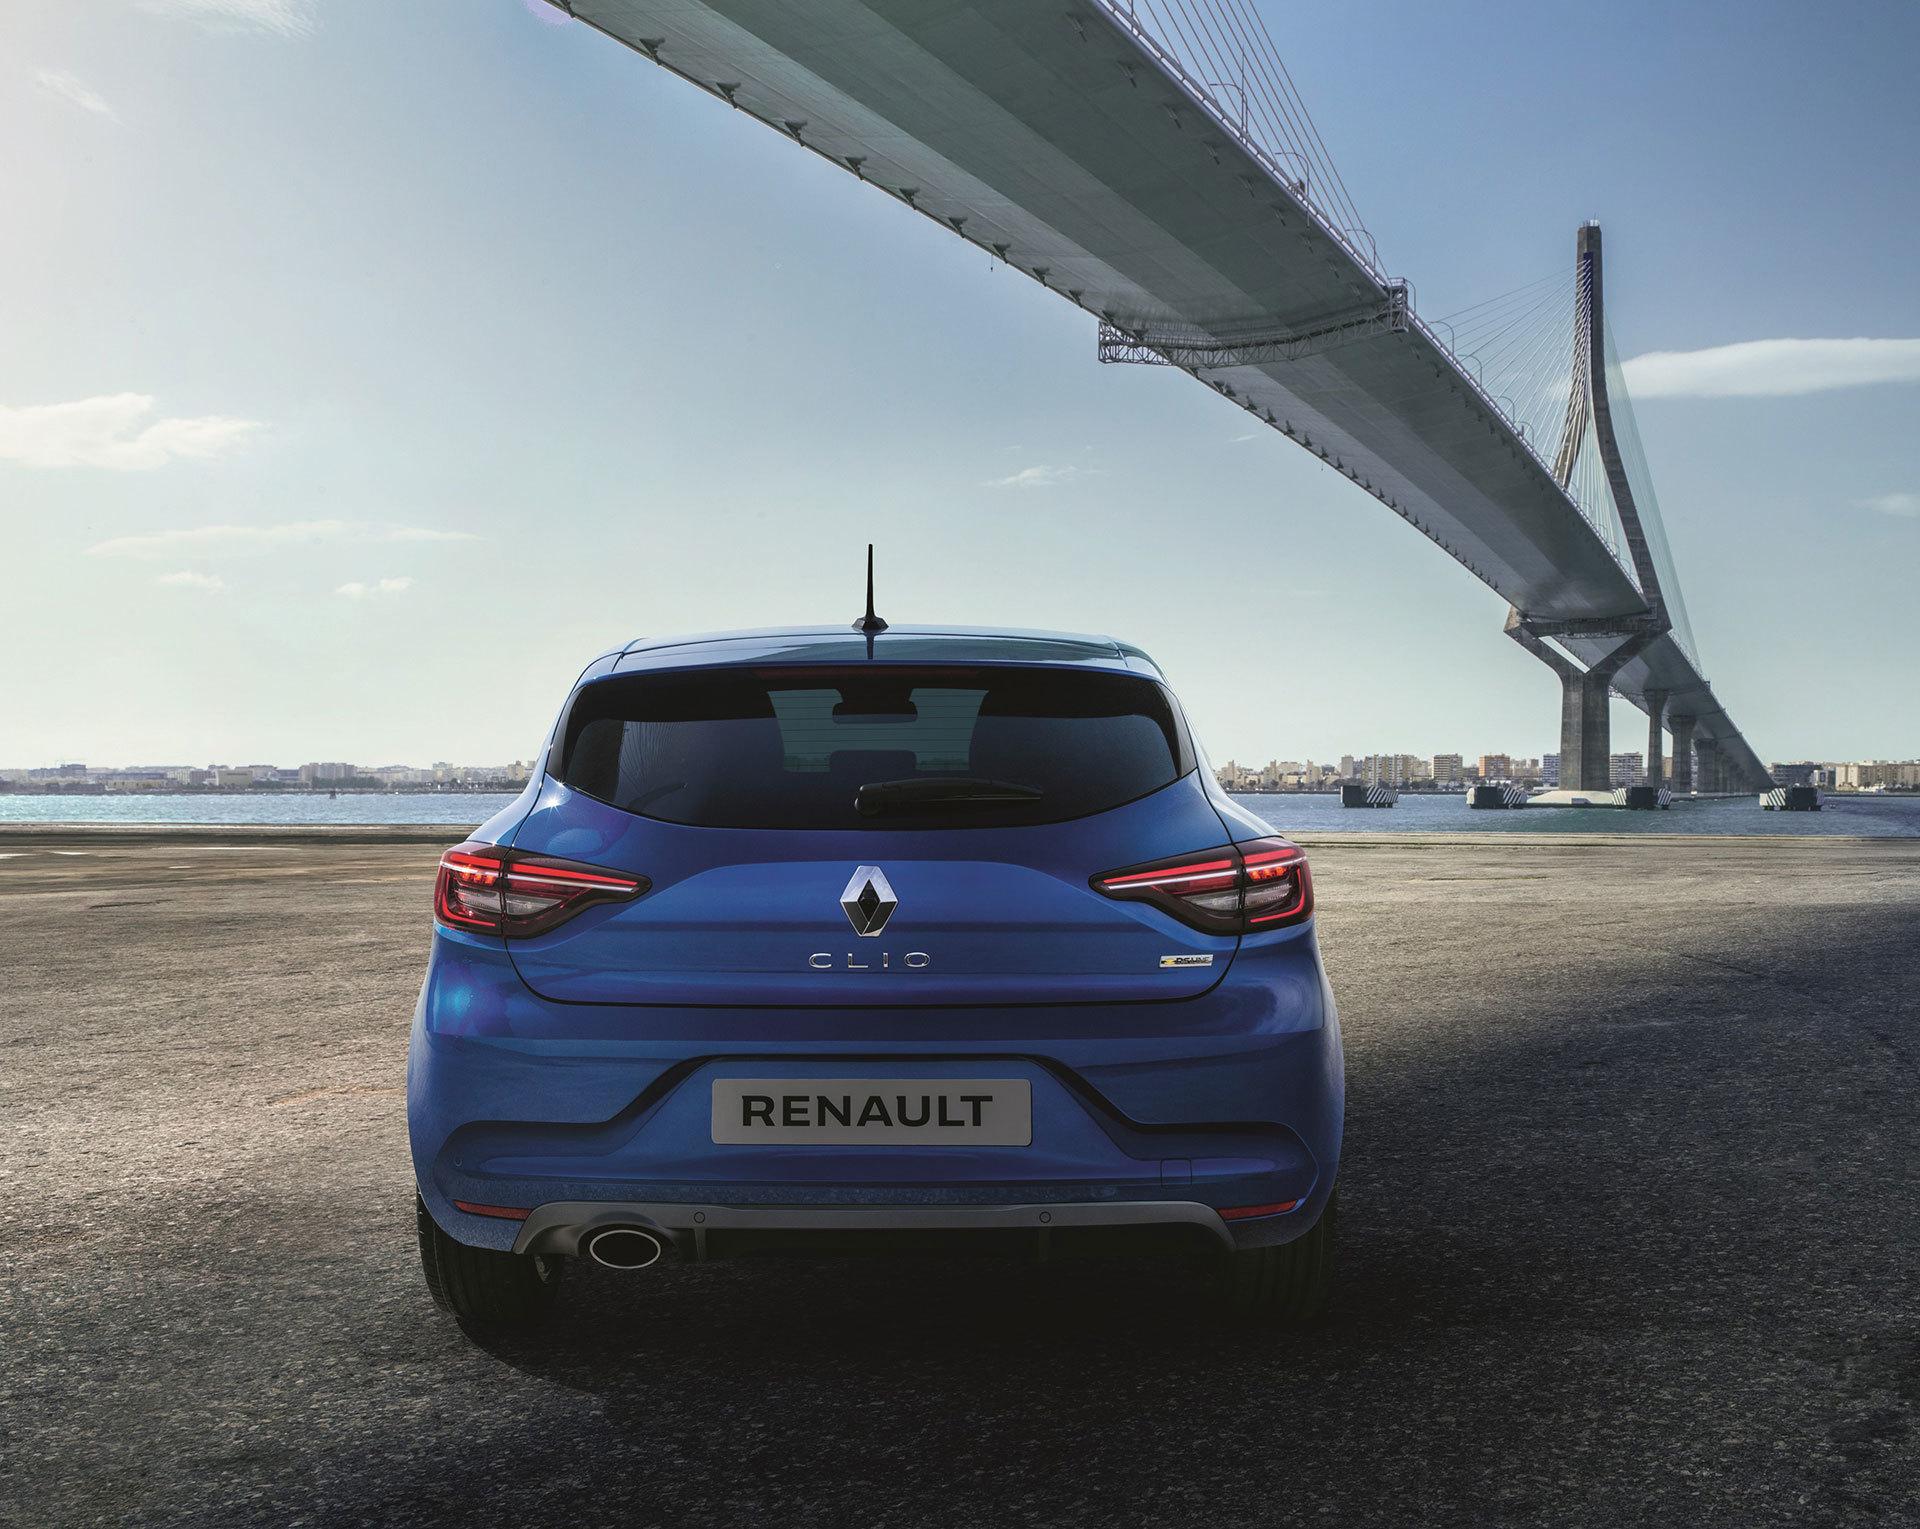 Renault Clio Rs Line 2019 Trasera Exterior 02